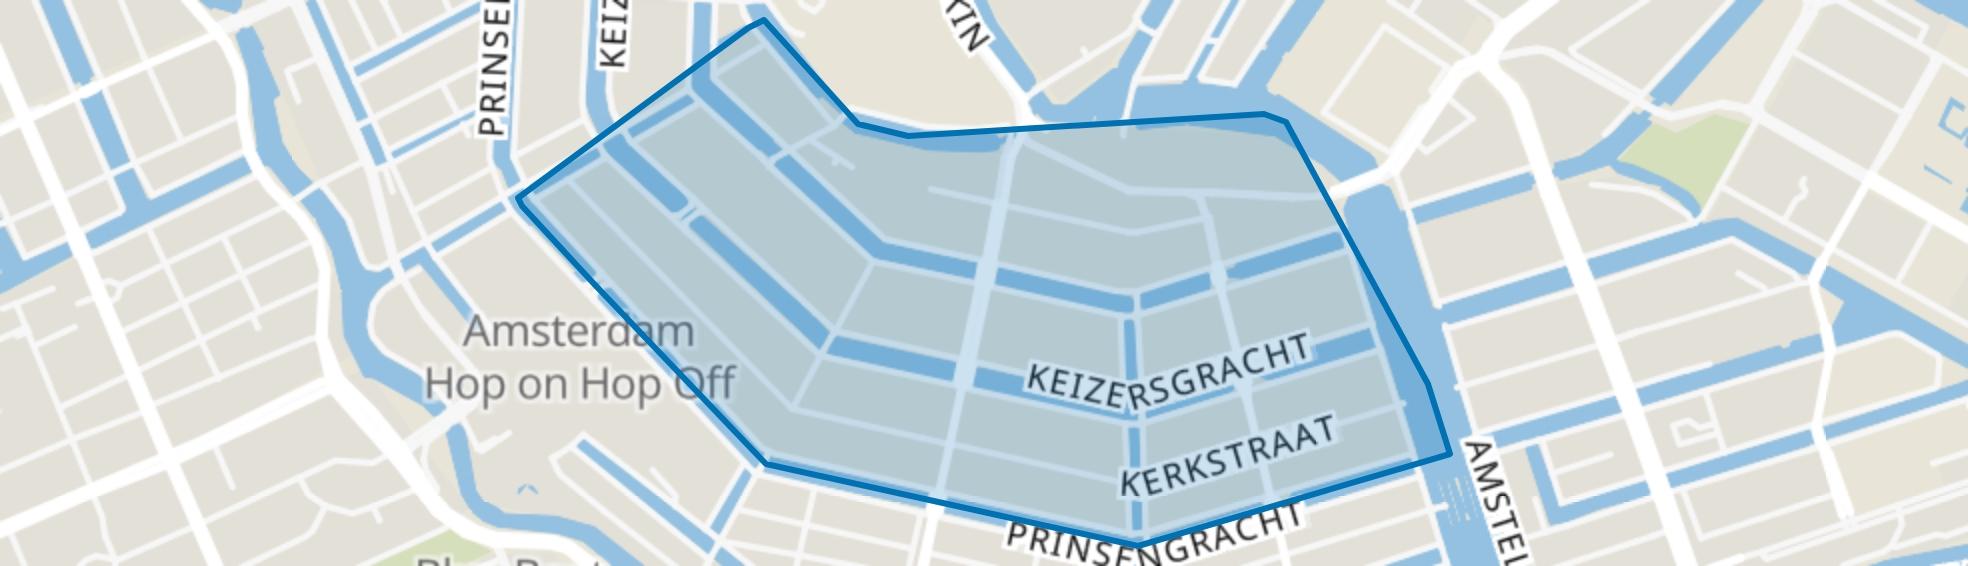 Grachtengordel-Zuid, Amsterdam map